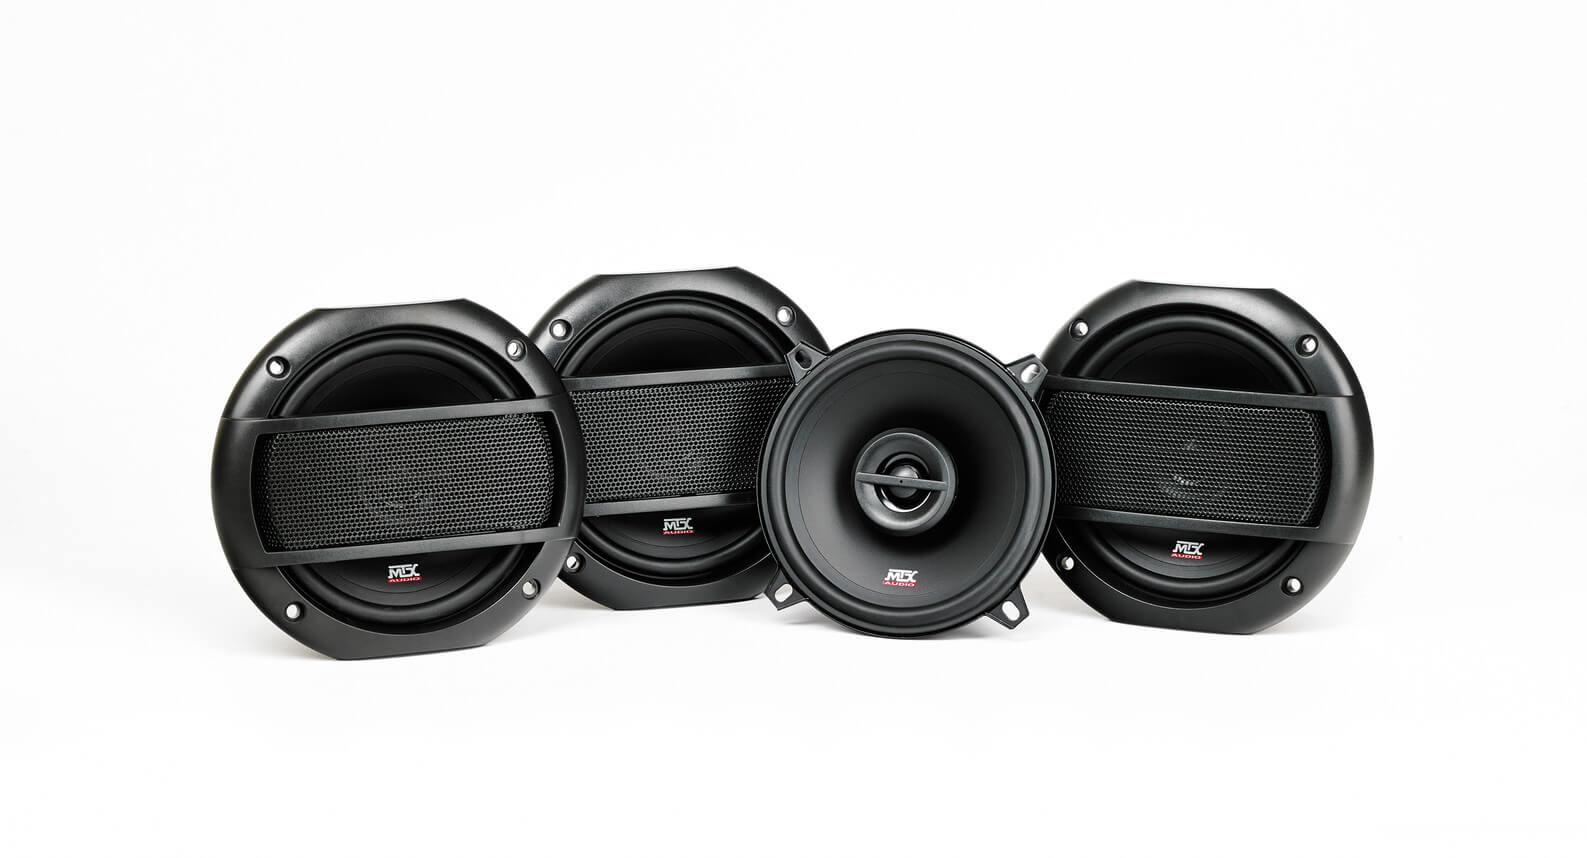 Baleno - Premium Speaker Upgrade Kit